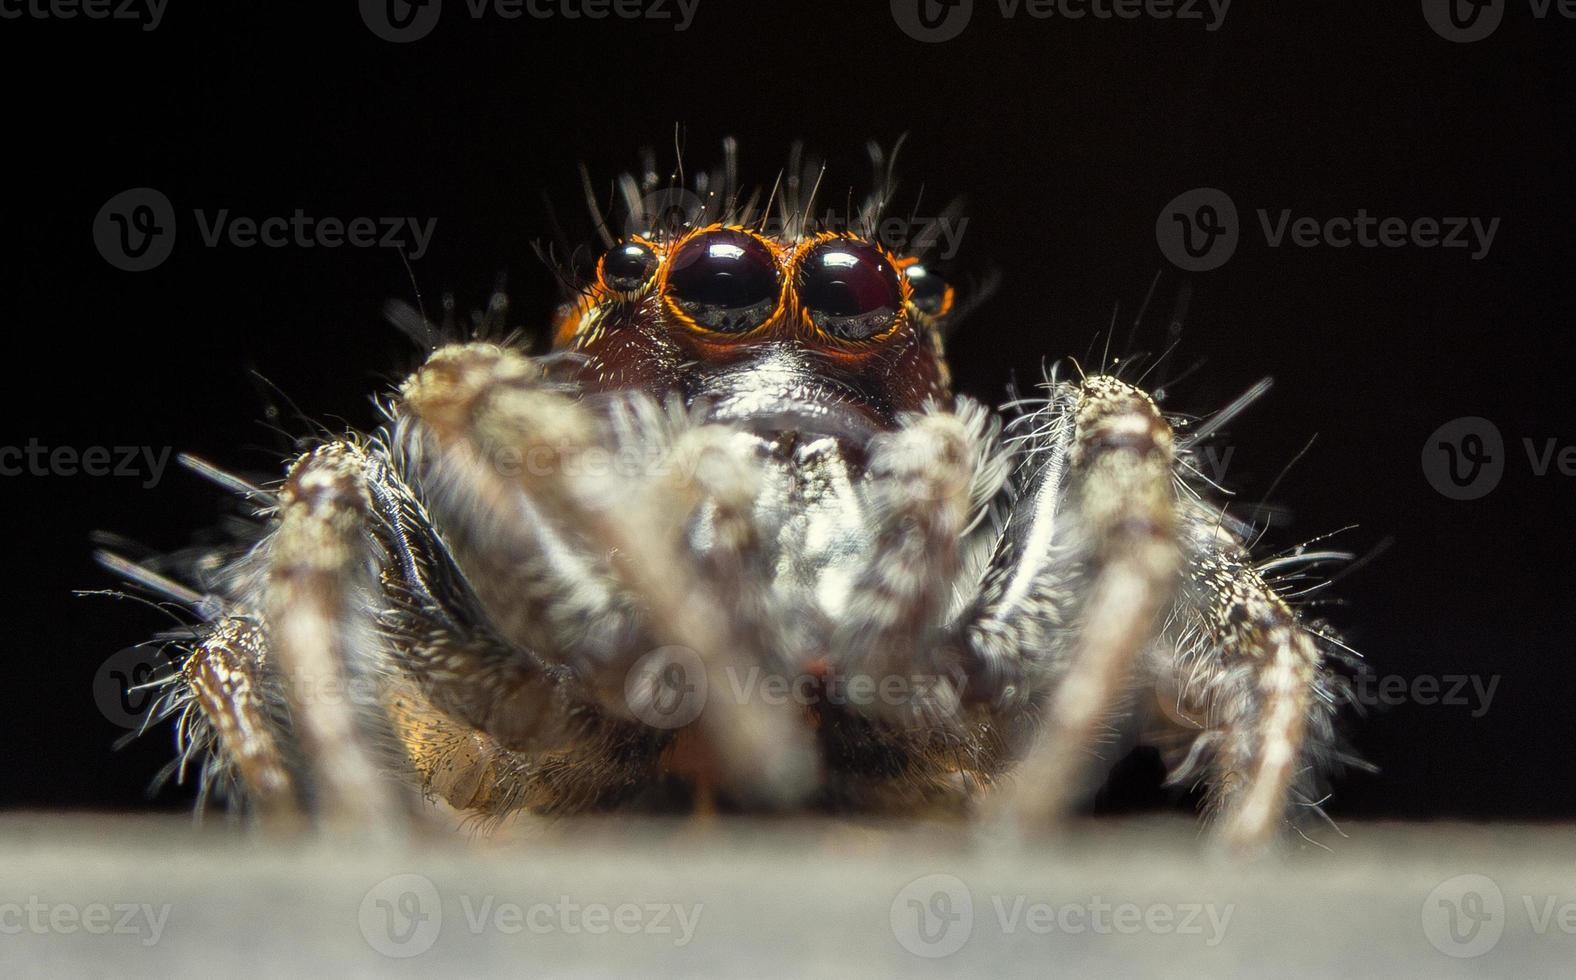 Araignée sauteuse mâle (Thiodina hespera) photo